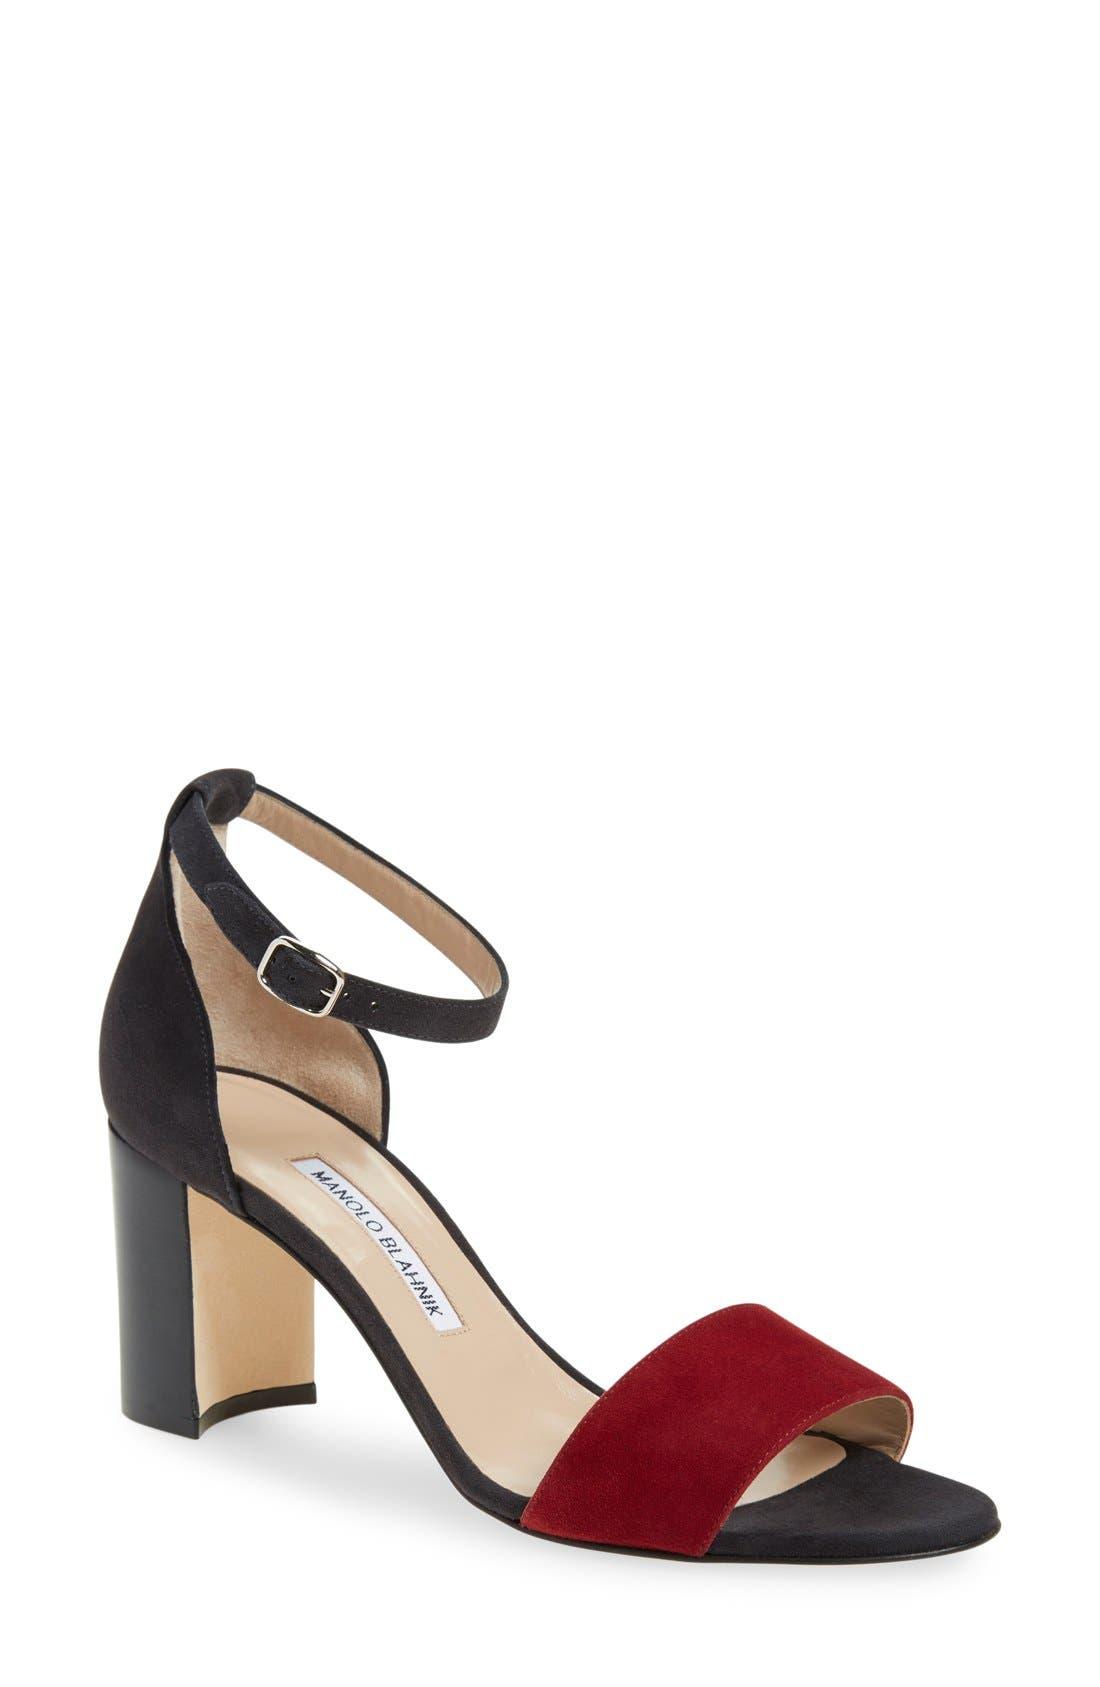 Alternate Image 1 Selected - Manolo Blahnik 'Lauratomod' Ankle Strap Sandal (Women)